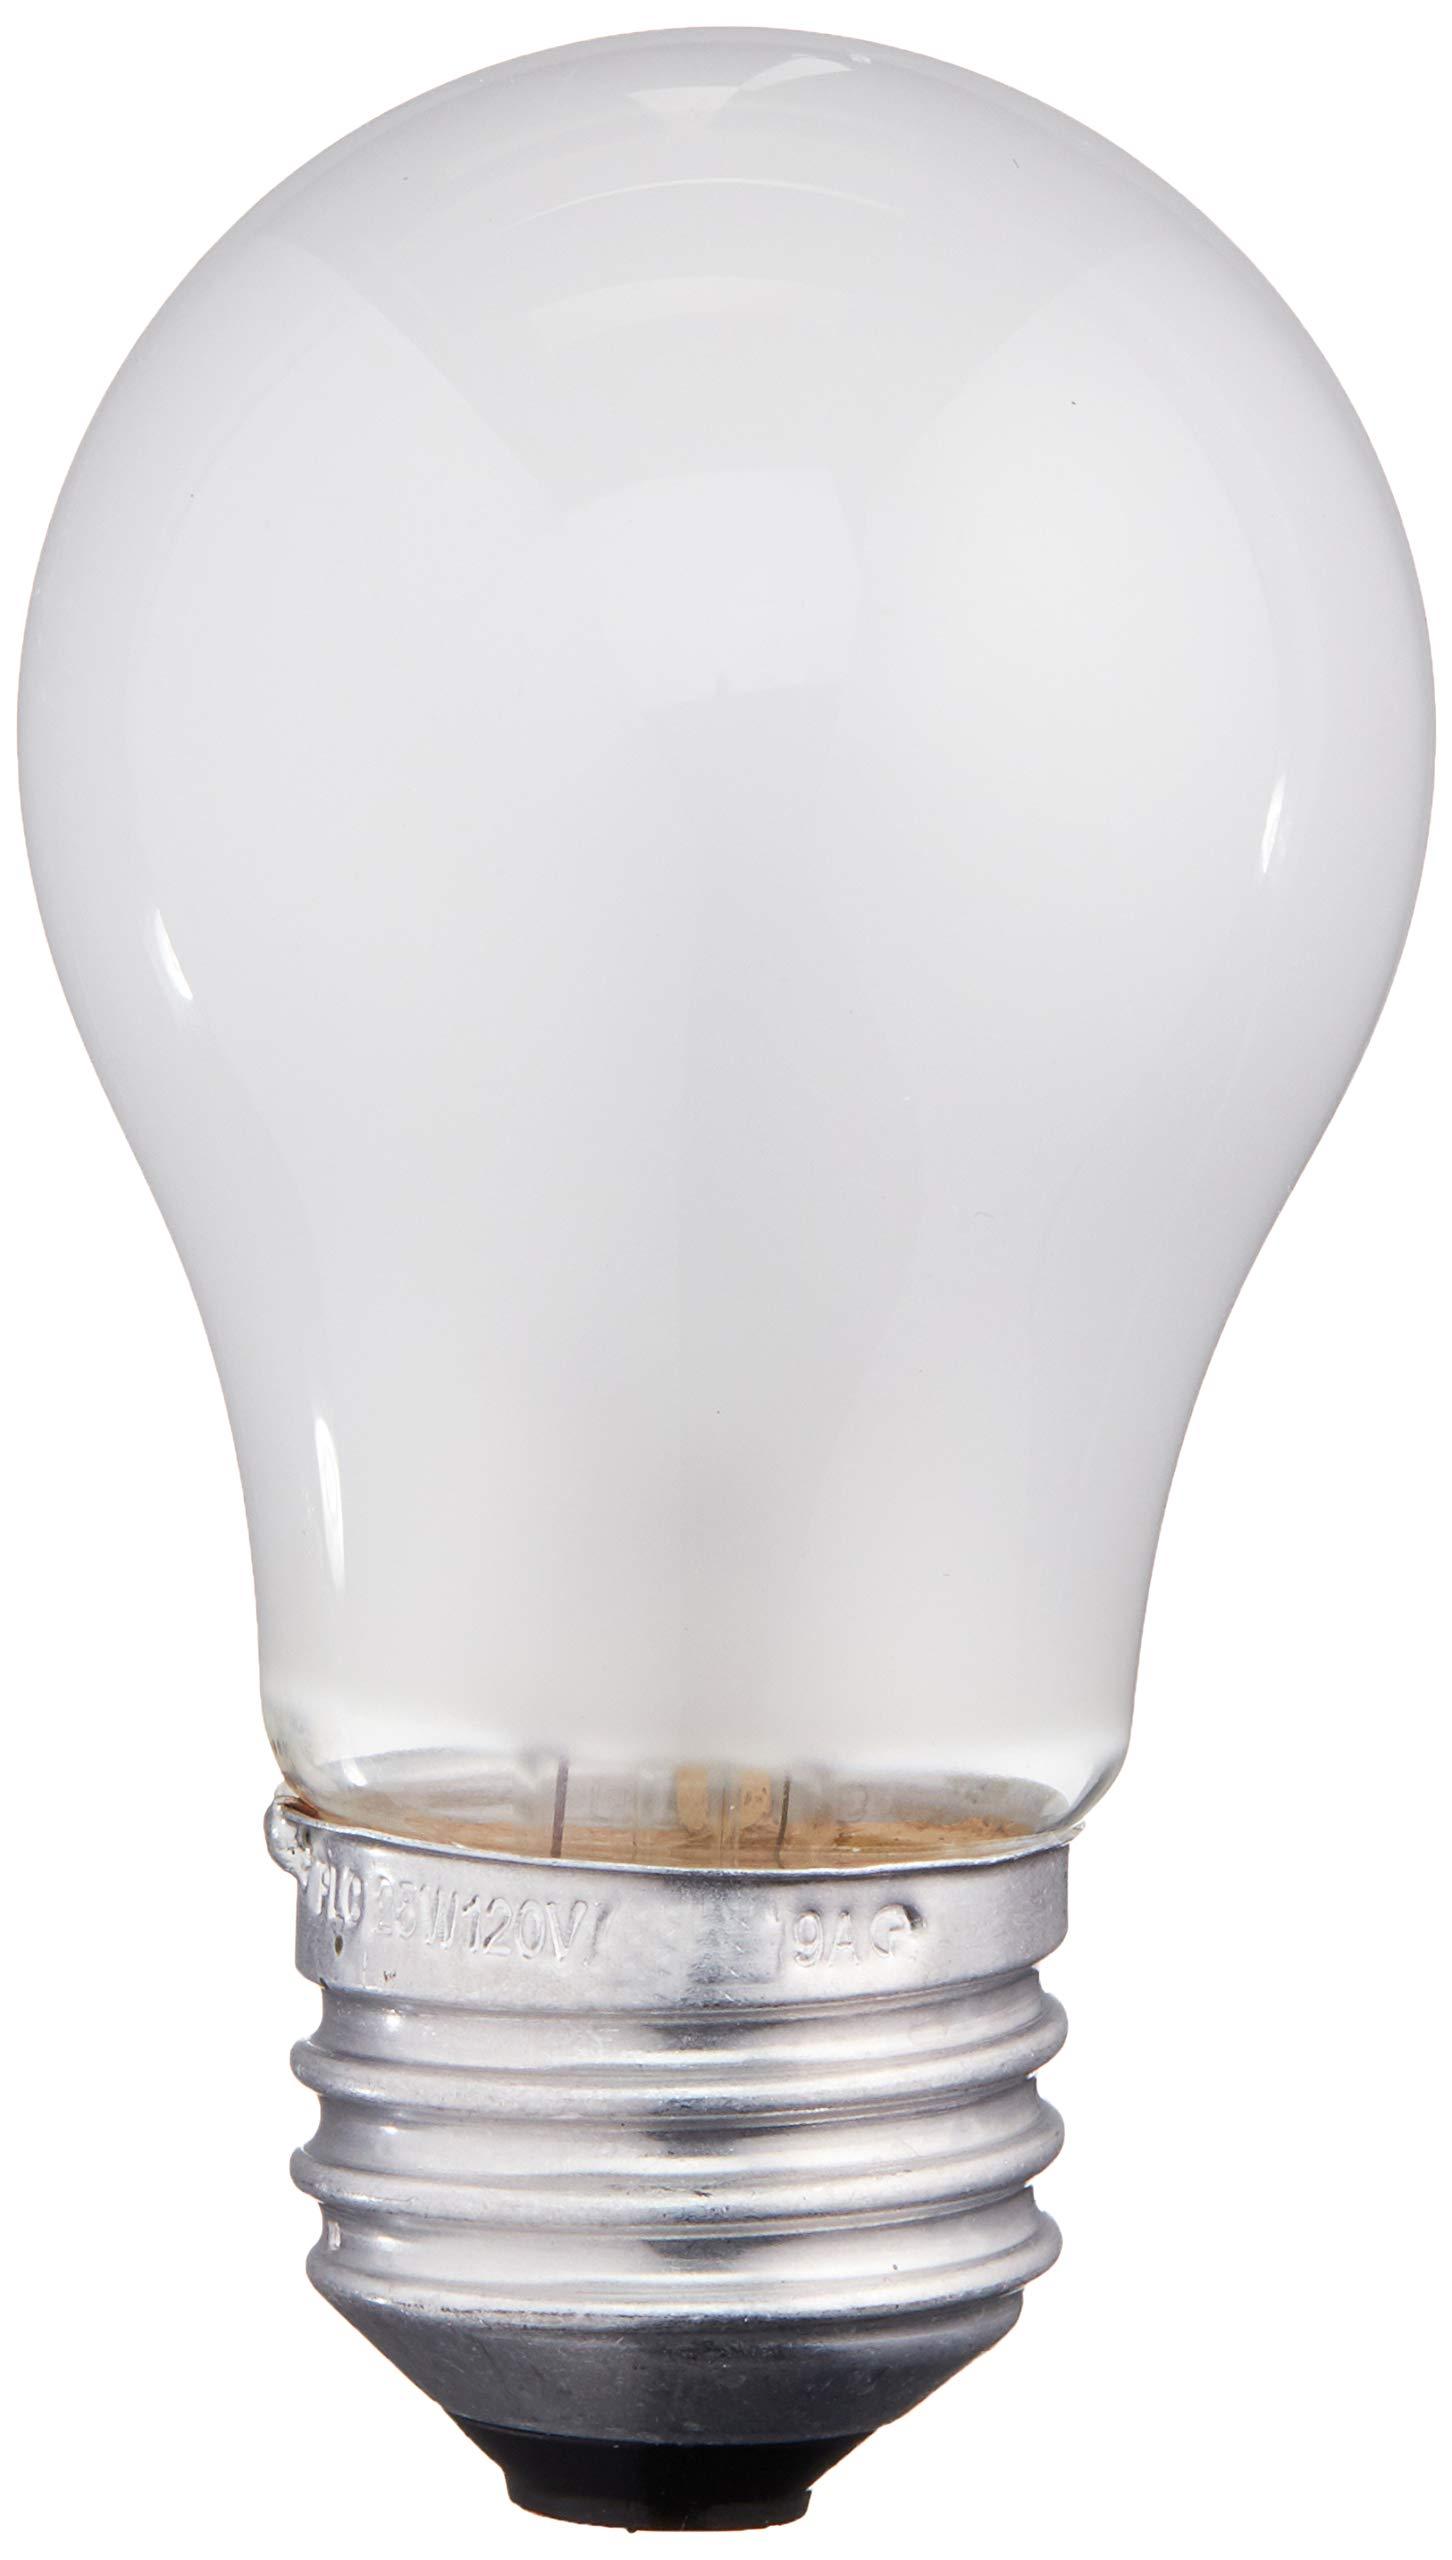 Philips 470385 Incandescent Light Bulb, White, 6 Piece